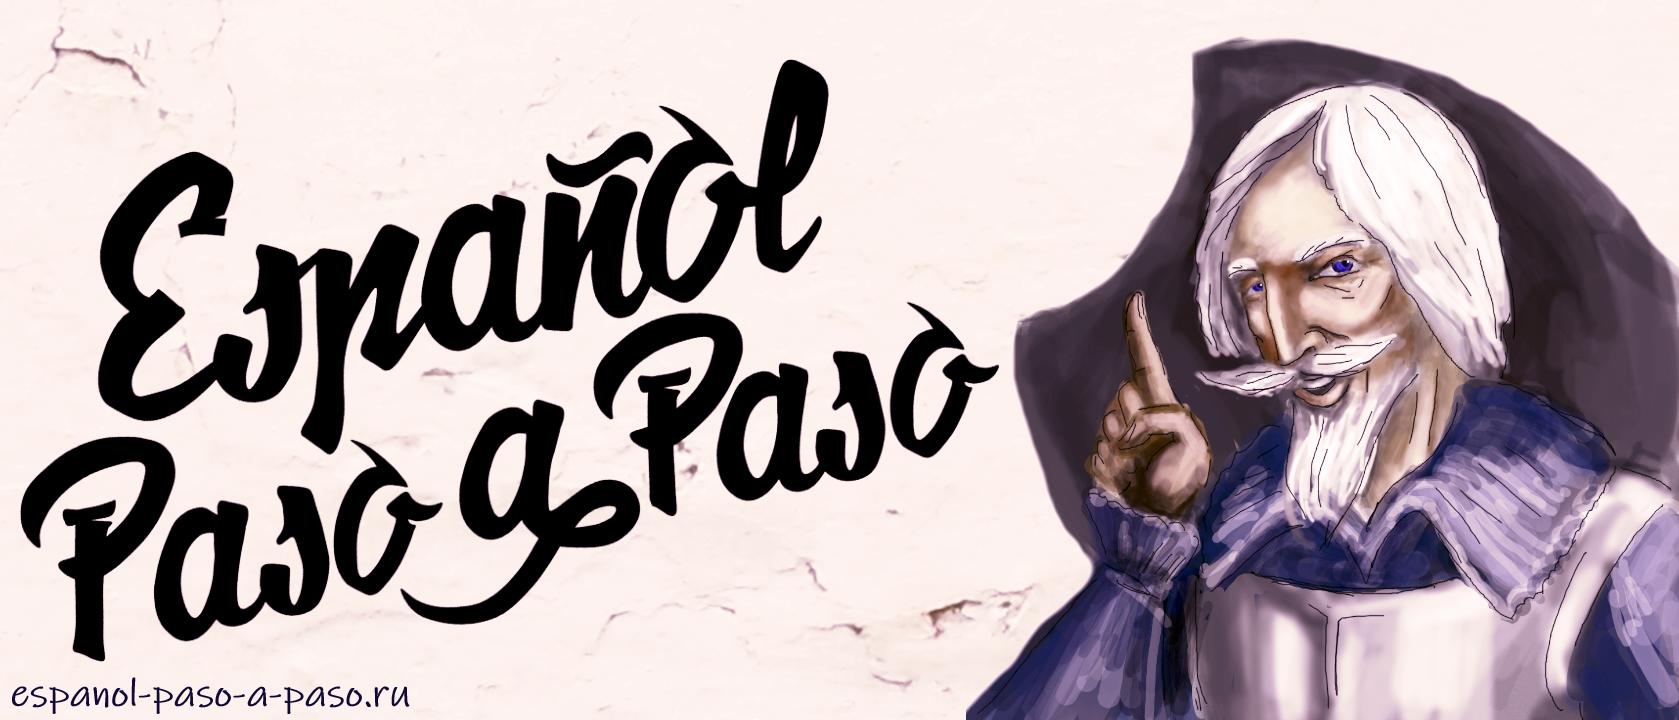 ESPAÑOL PASO A PASO by DARIA BOBRIK